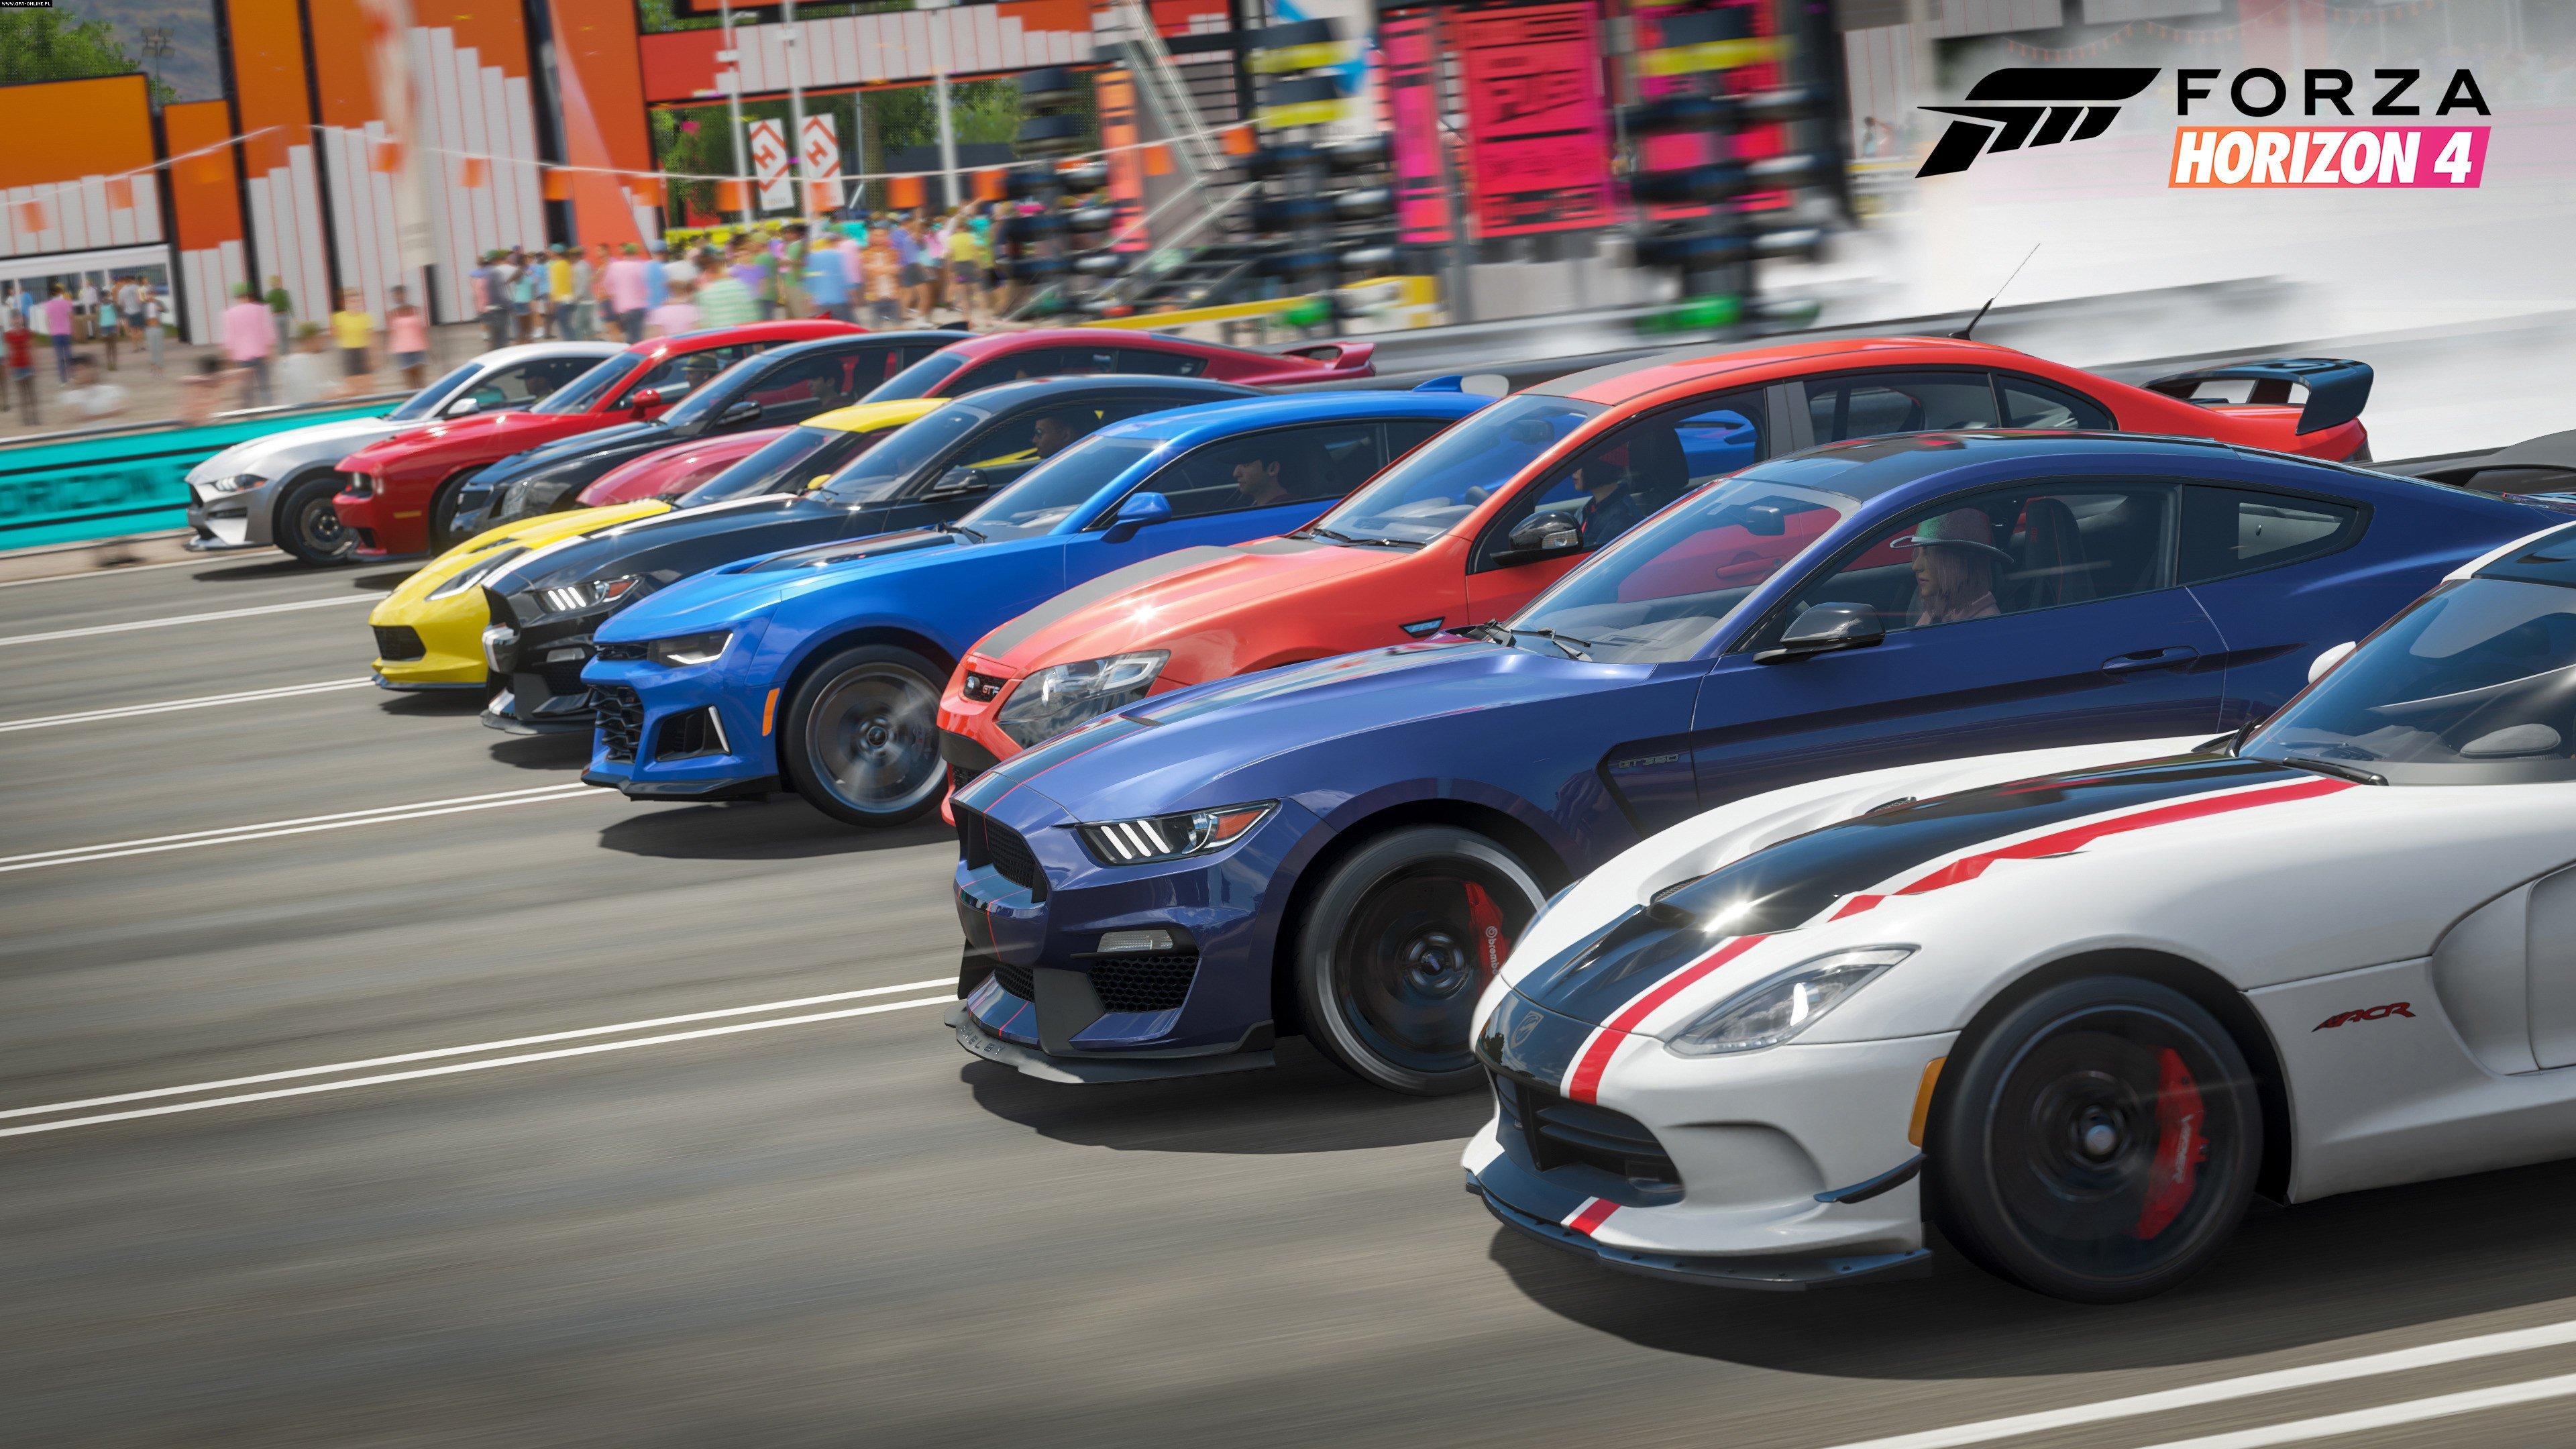 Forza Horizon 4 PC Requisitos Minimos para jogar!